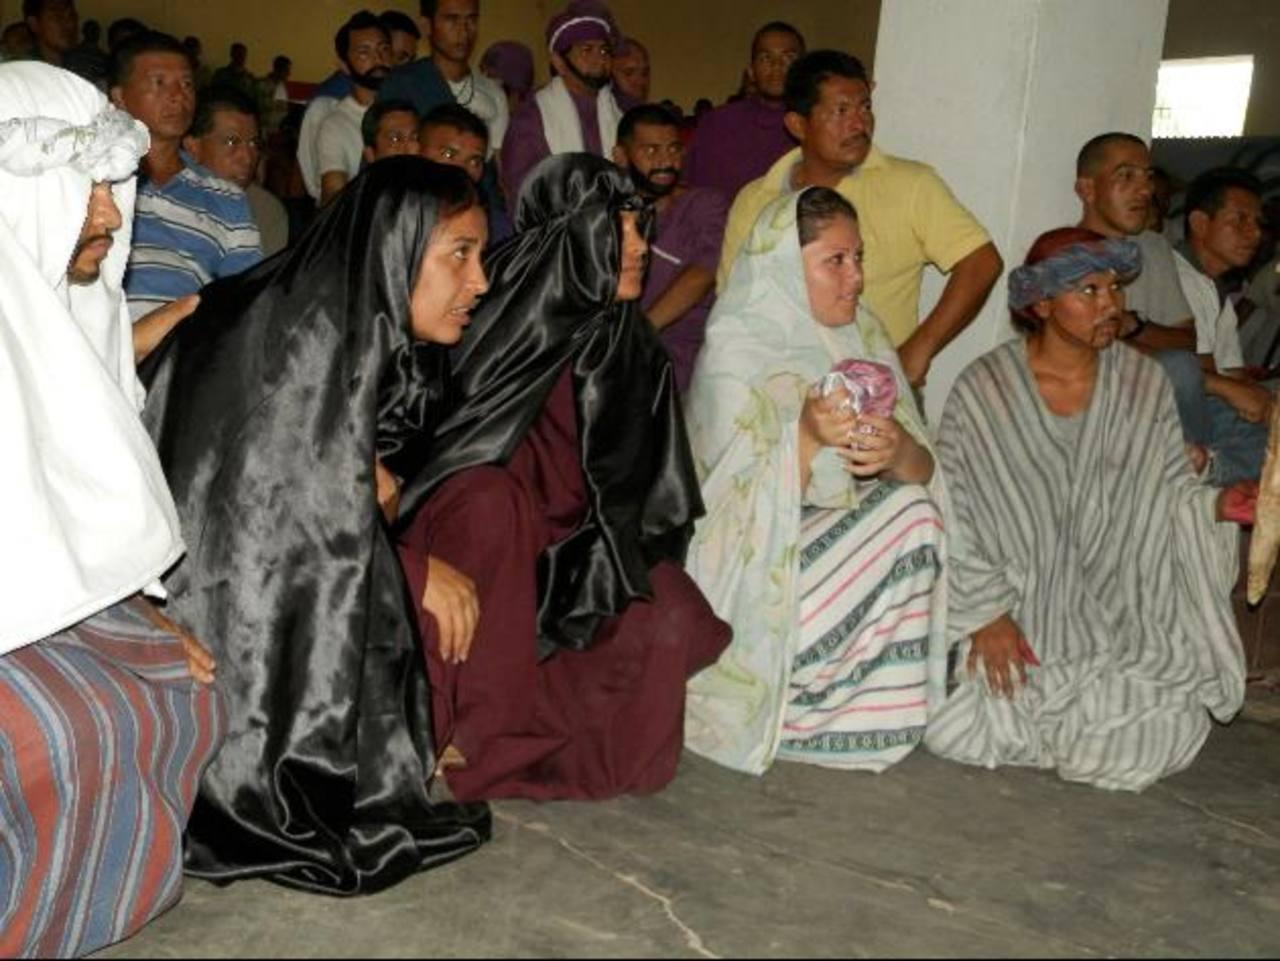 Privados de libertad de Apanteos también celebran la Semana Santa. Foto EDH / Milton Jaco